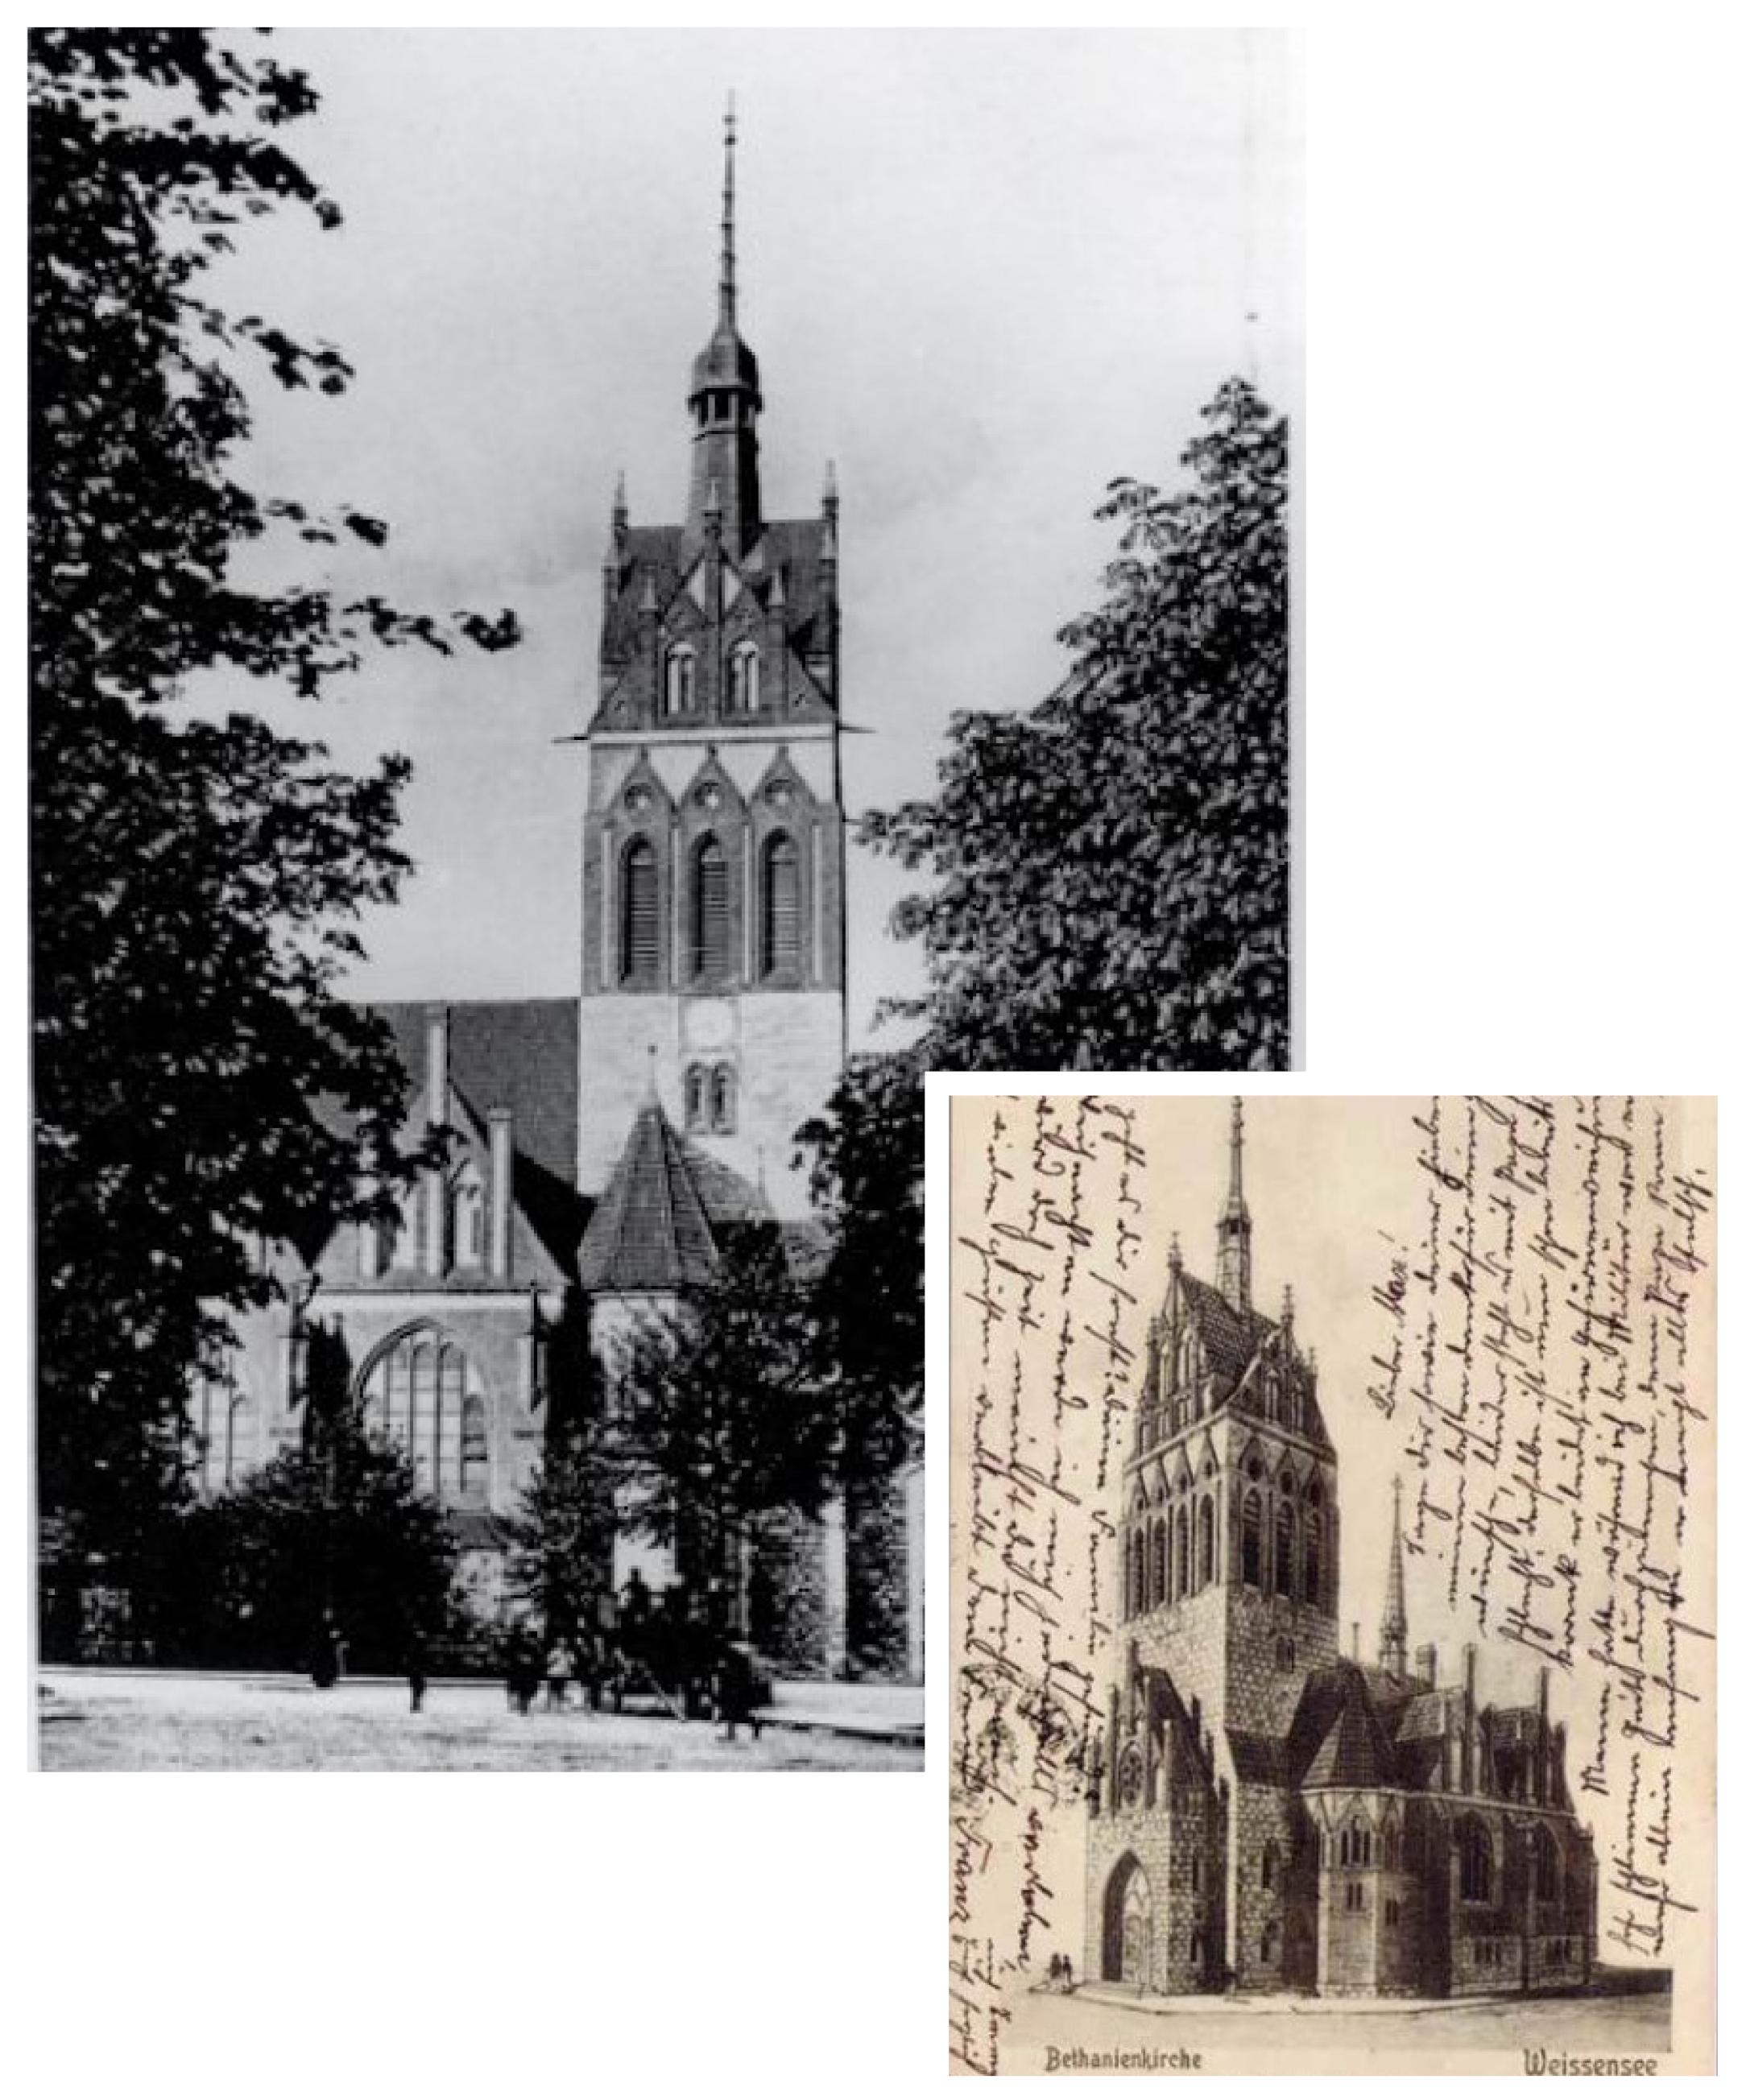 Bethanienturm Historie